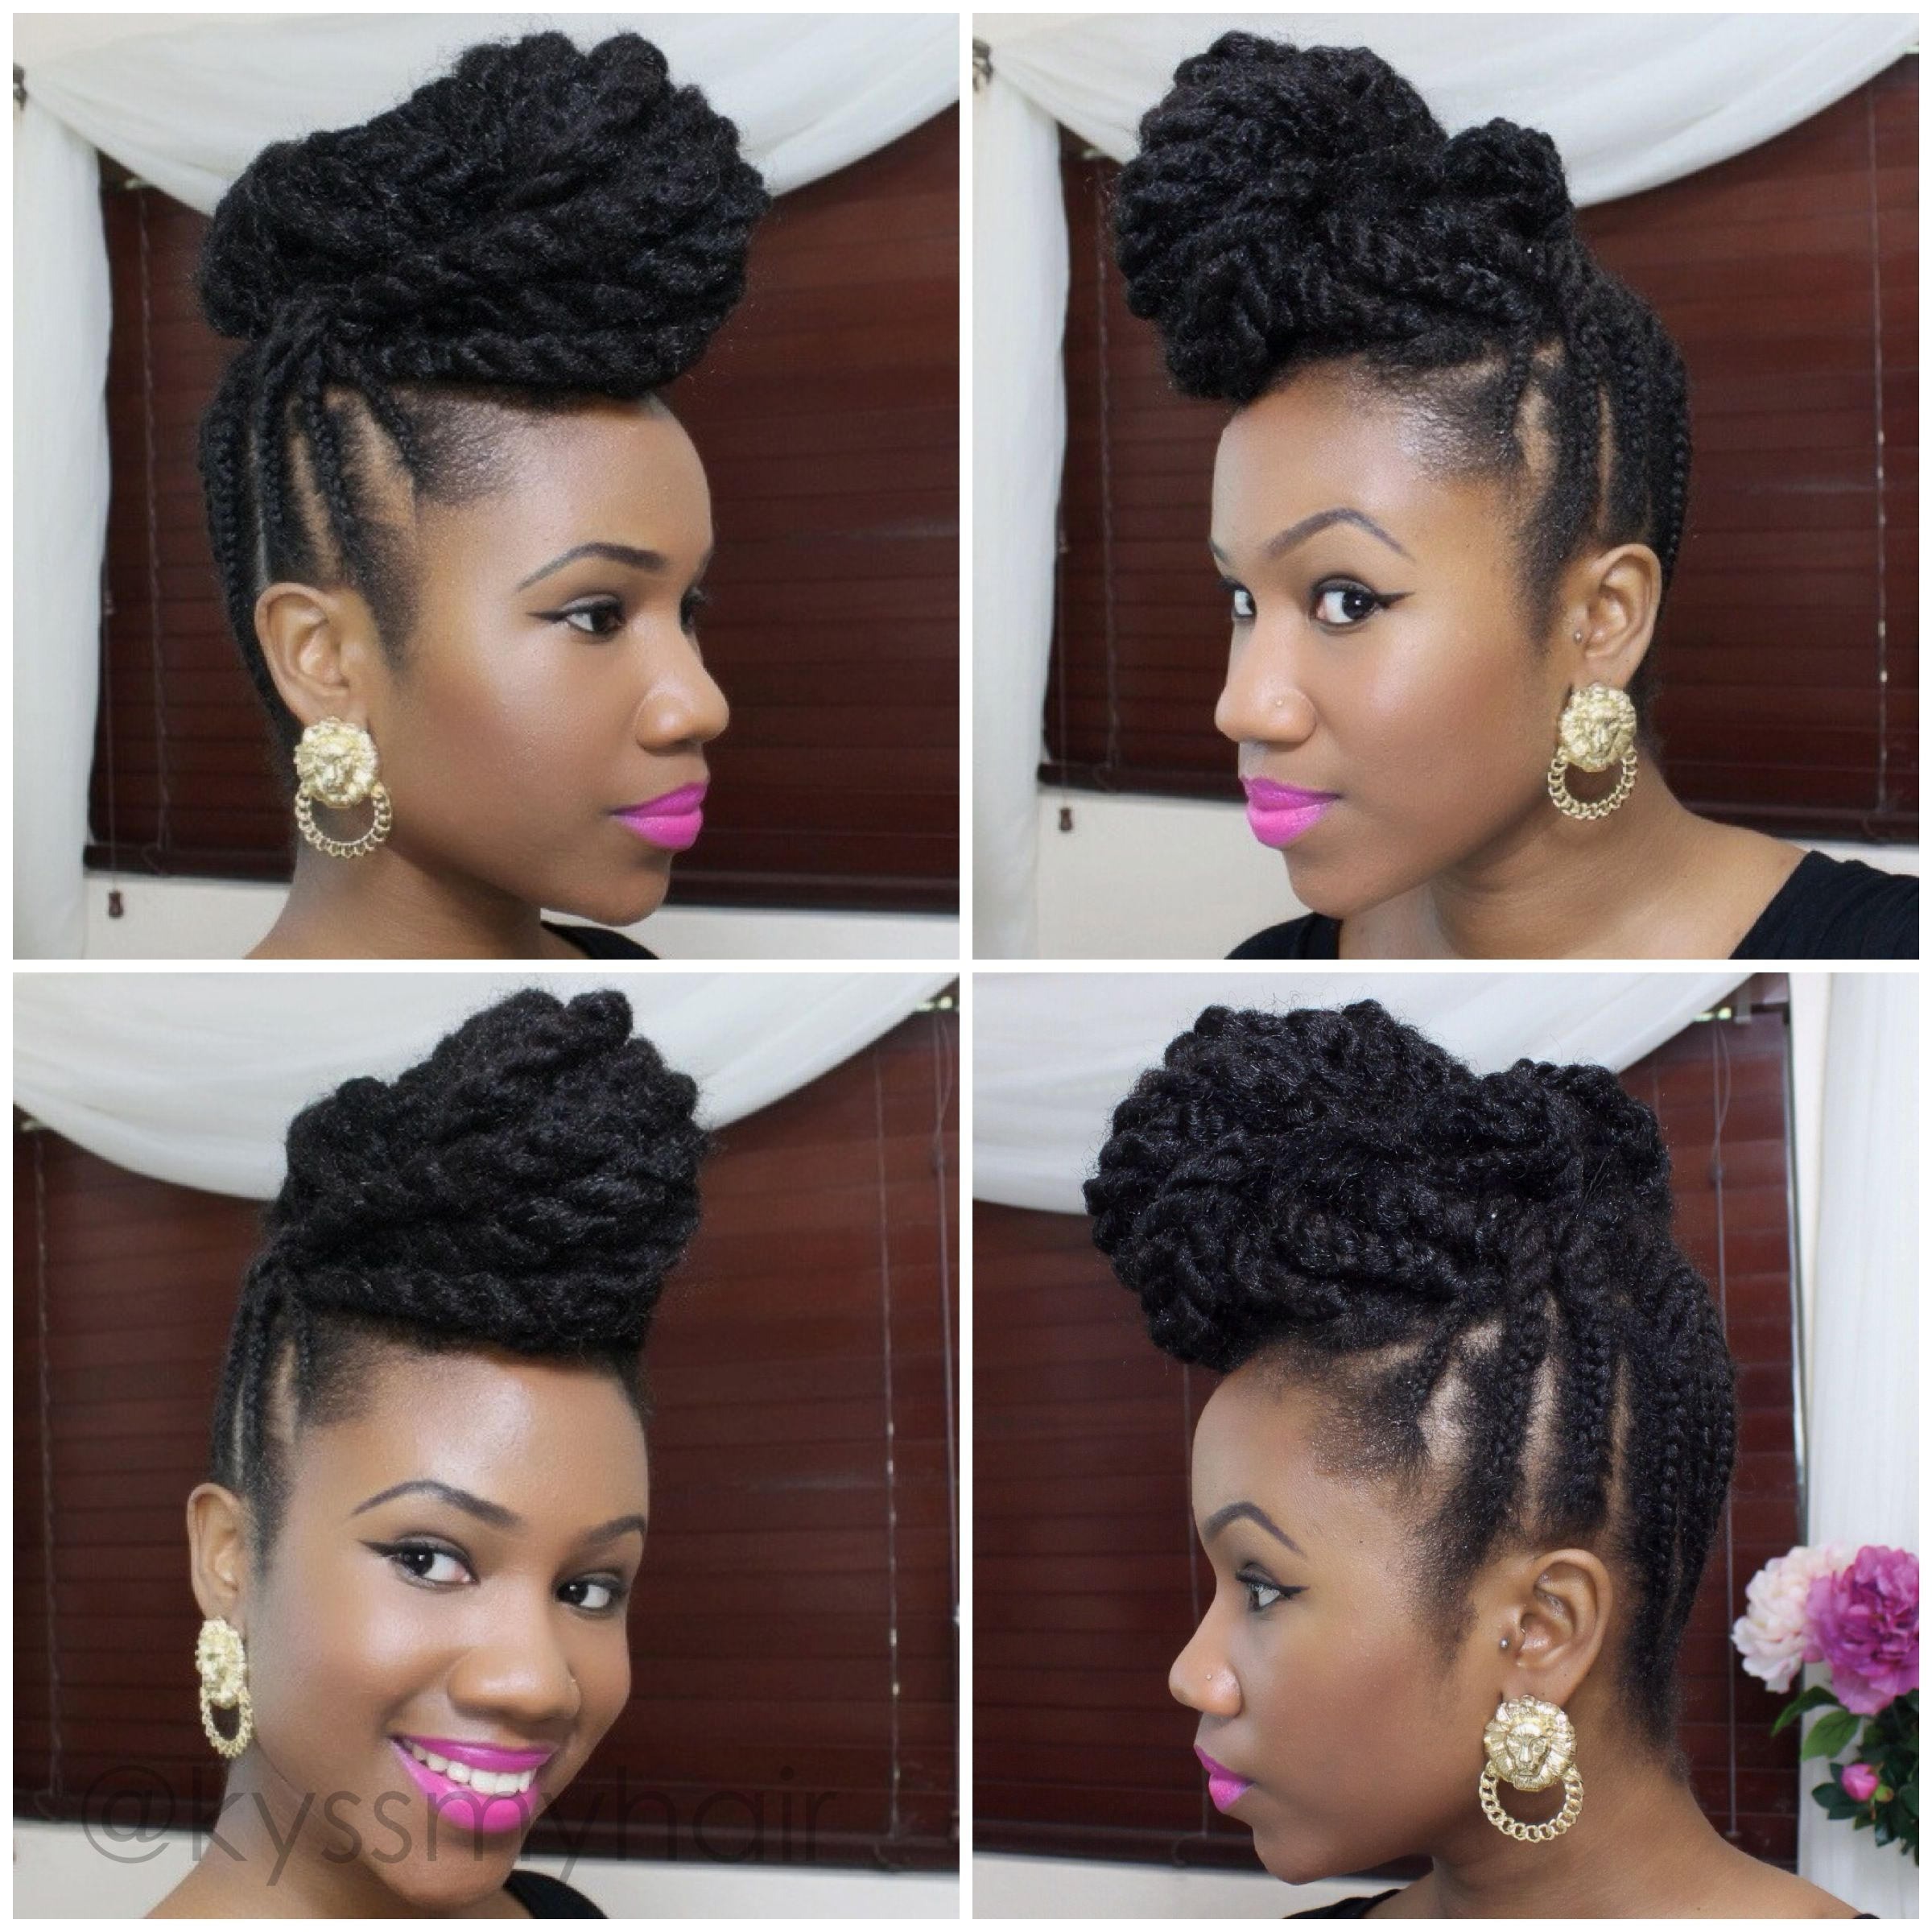 Braided updo on natural hair using marley hair kyss my hair marley hair braided updo hairstyles for natural hair pmusecretfo Choice Image